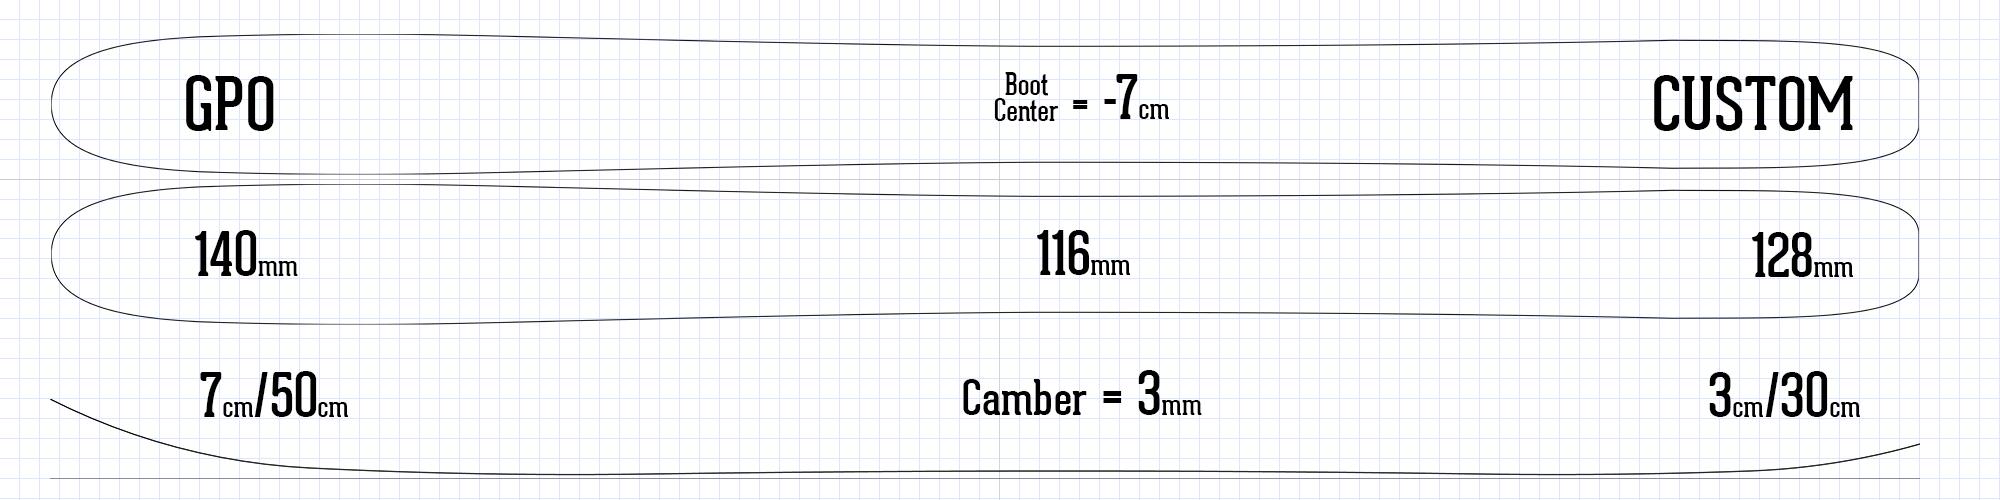 GPO Ski Information rocker camber profile specs